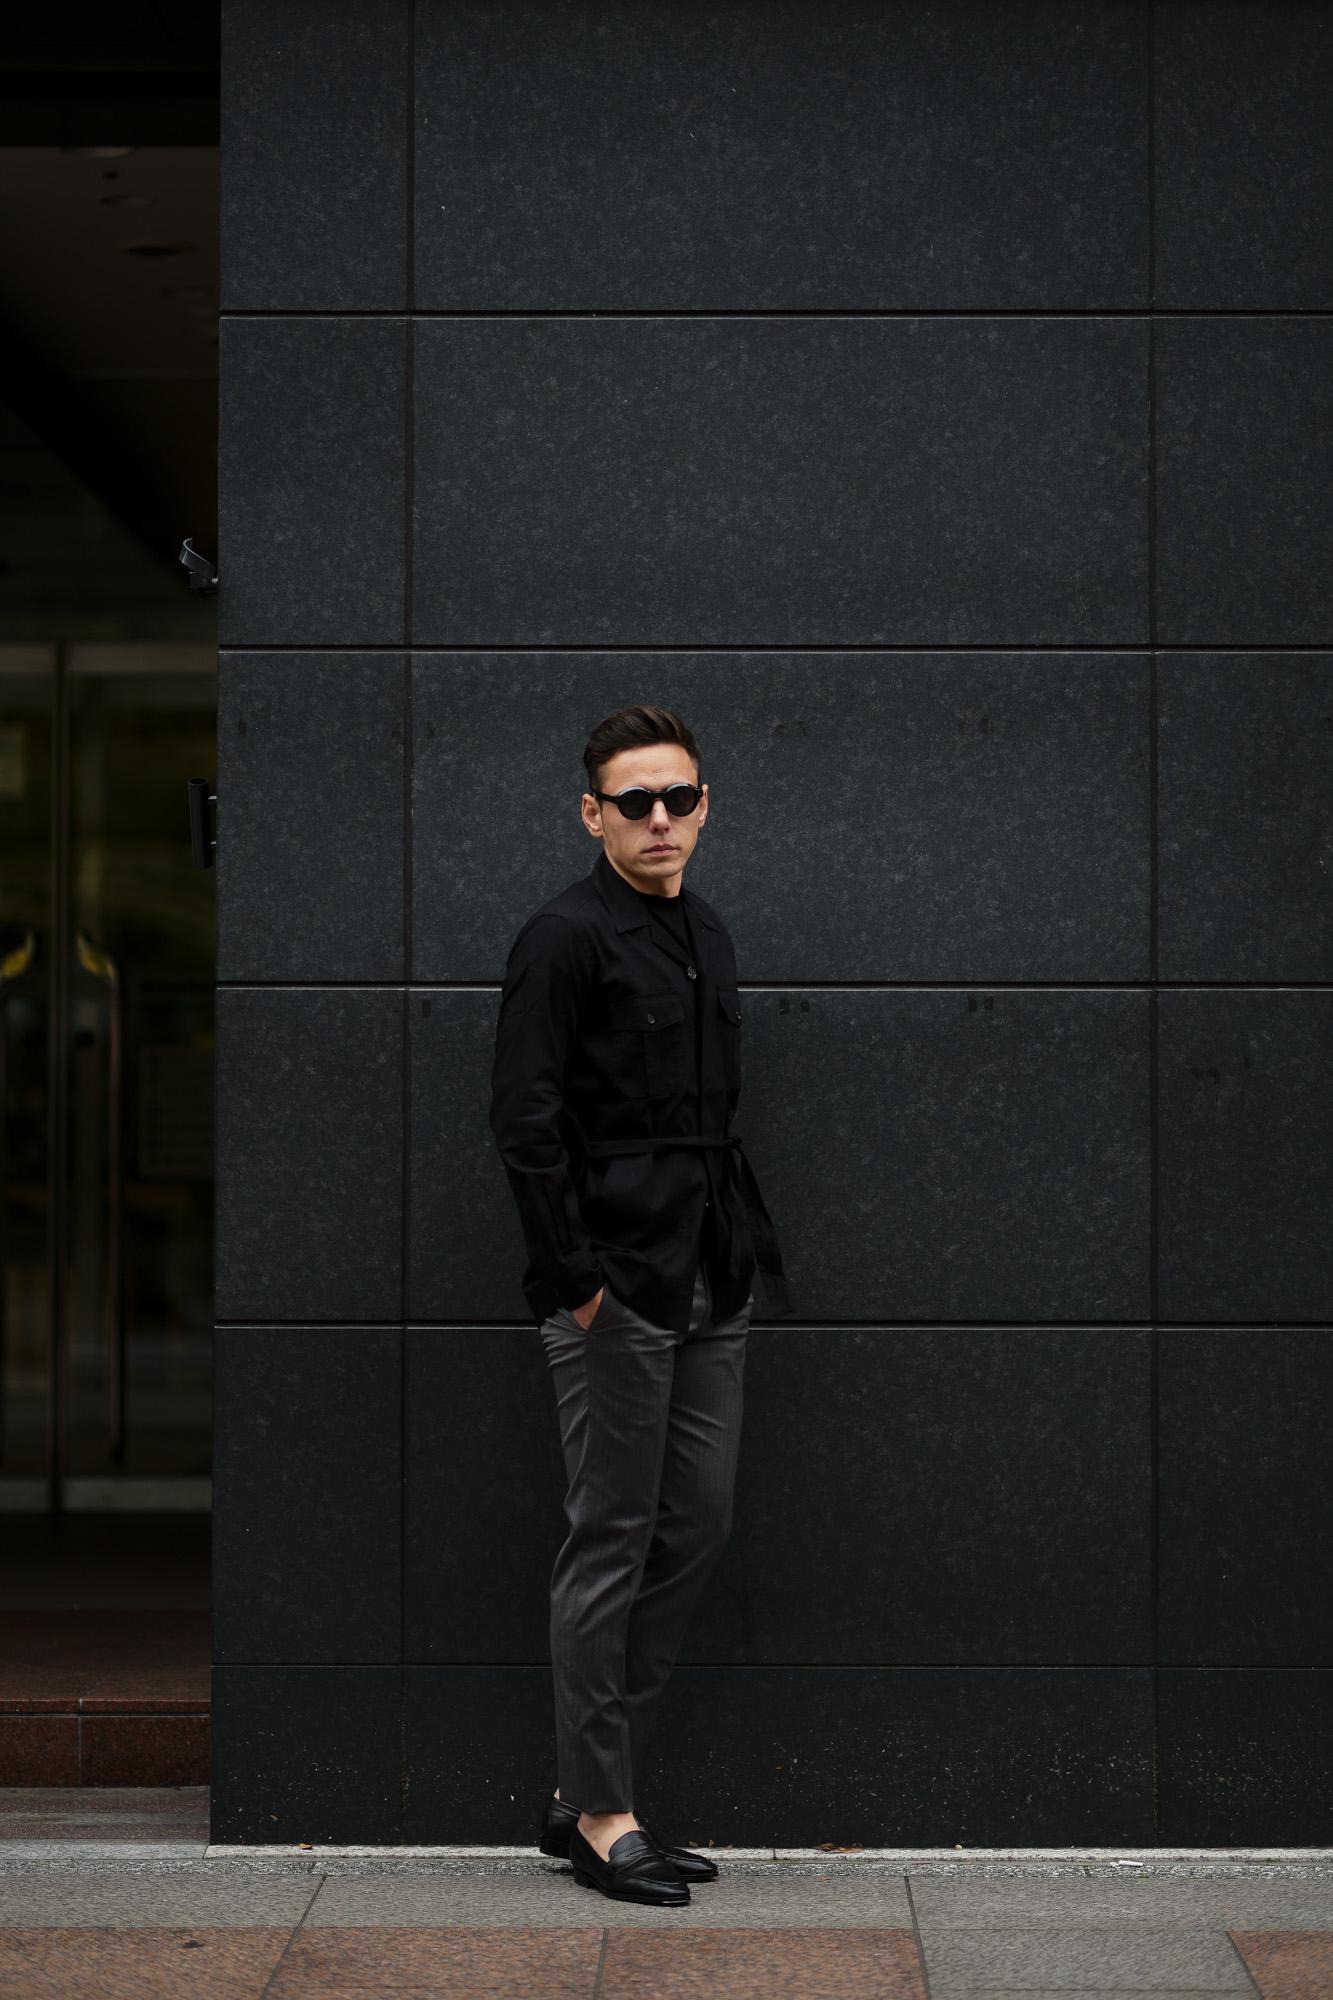 ORIAN (オリアン) LARMY リネンコットン サファリ ジャケット BLACK (ブラック・90) Made in italy (イタリア製) 2020 春夏 【ご予約受付中】愛知 名古屋 altoediritto アルトエデリット